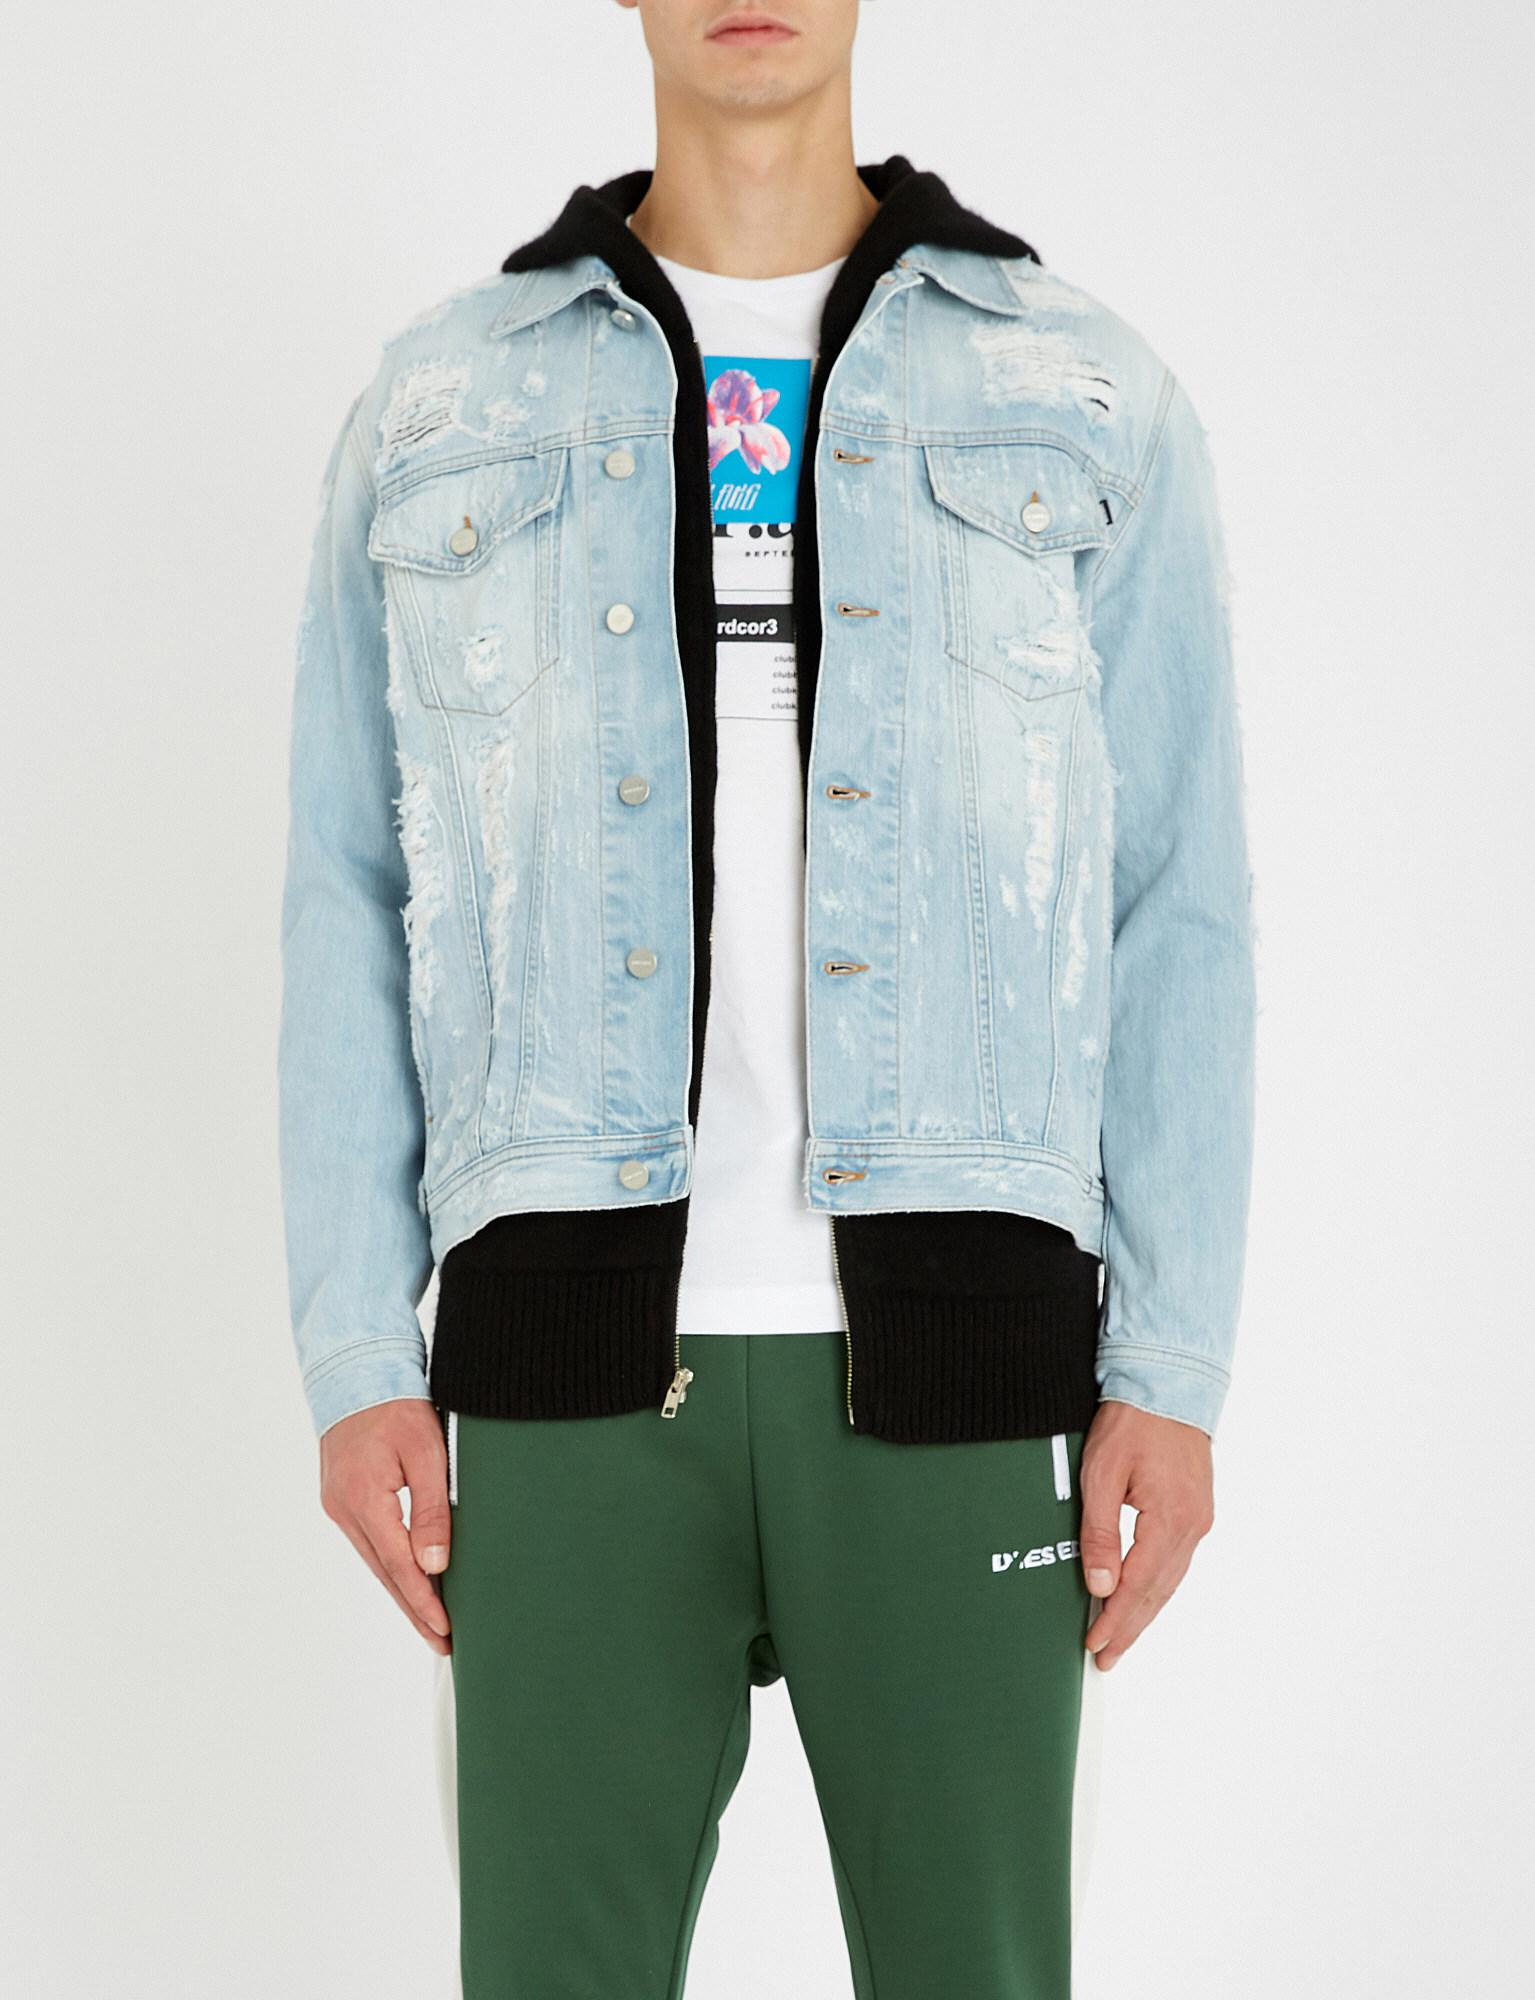 dbc26ad5d6f74 DIESEL D-hill Distressed Denim Jacket in Blue for Men - Lyst